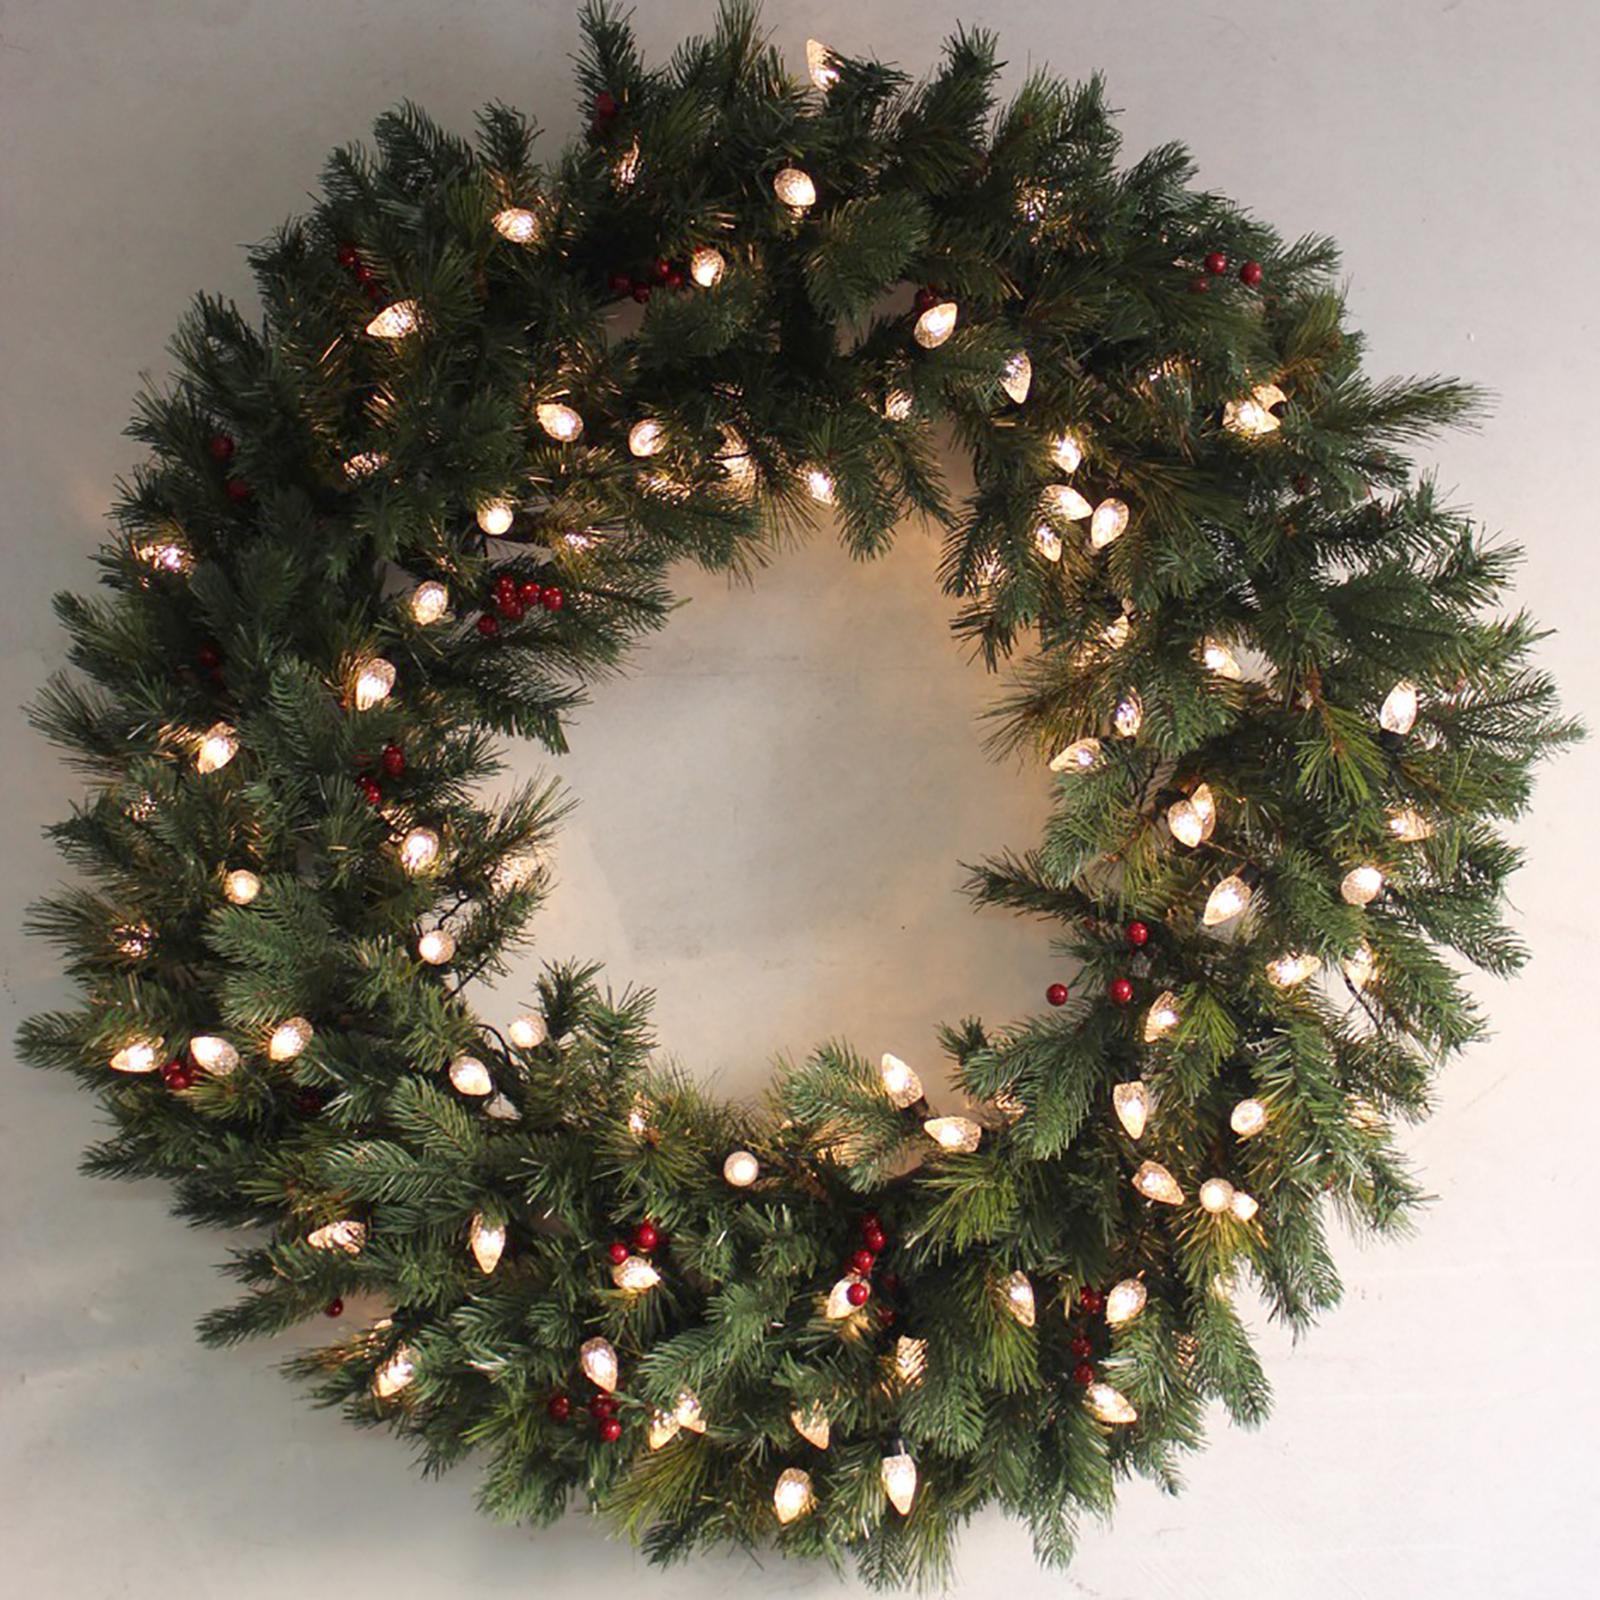 Giant Artificial Christmas Wreath - Green Pine Prelit Warm ...